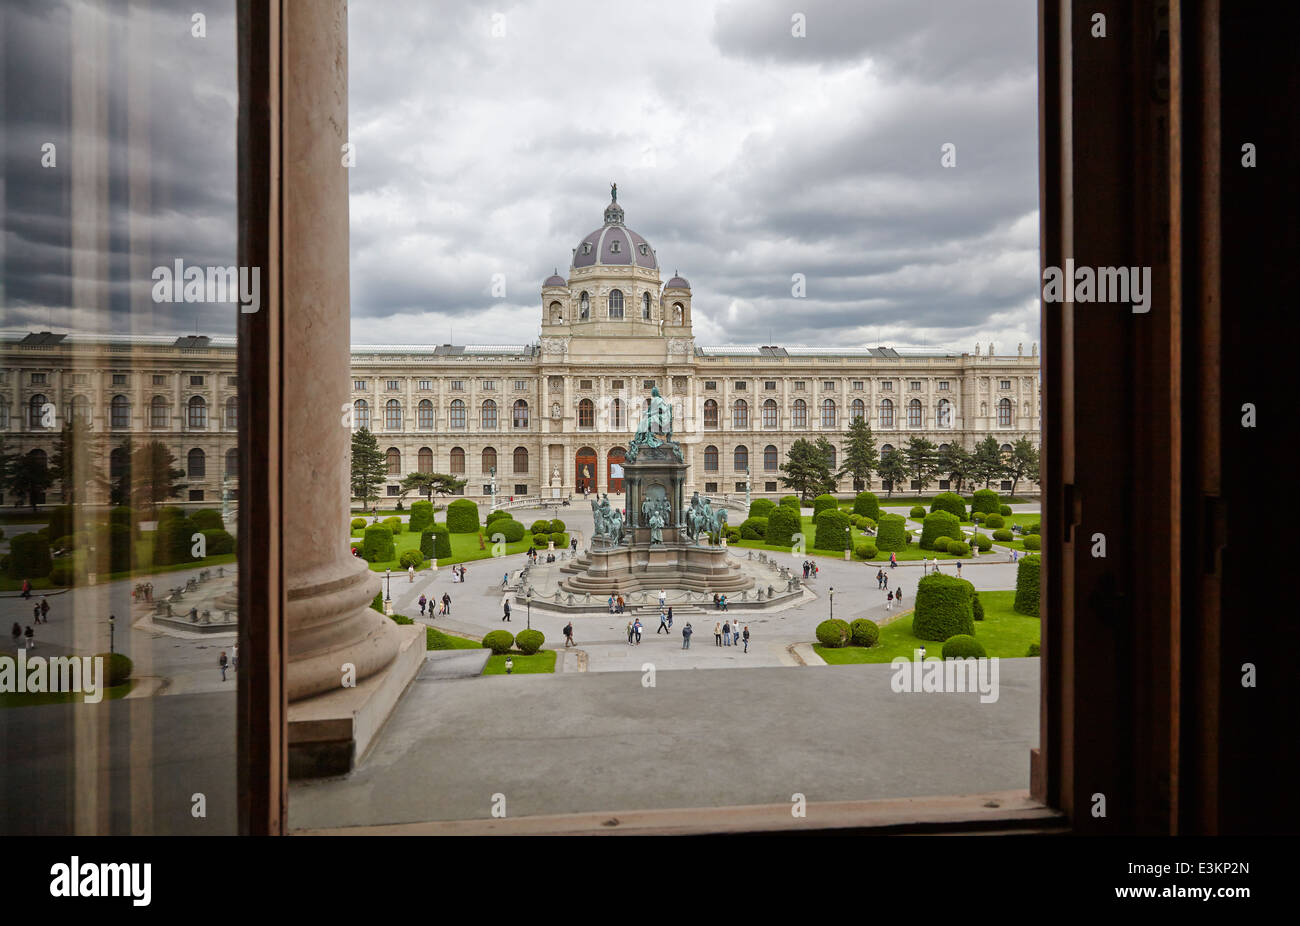 Kunsthistorisches Museum Wien (museum of art history Vienna) seen from the window of the Naturhistorsches Museum - Stock Image